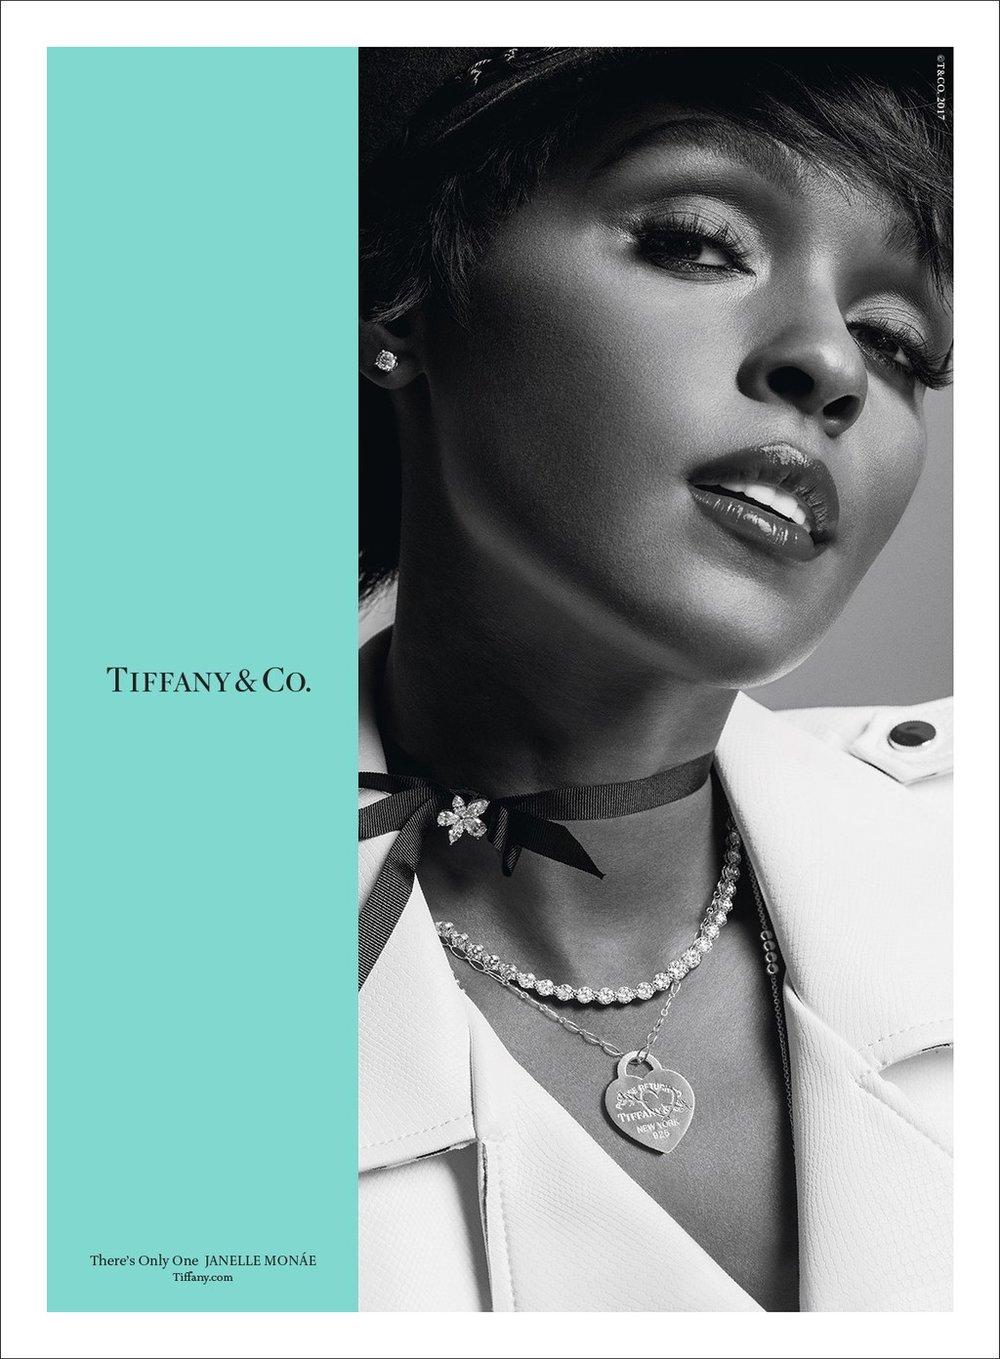 tiffany-co-fall-2017-campaign-5.jpg